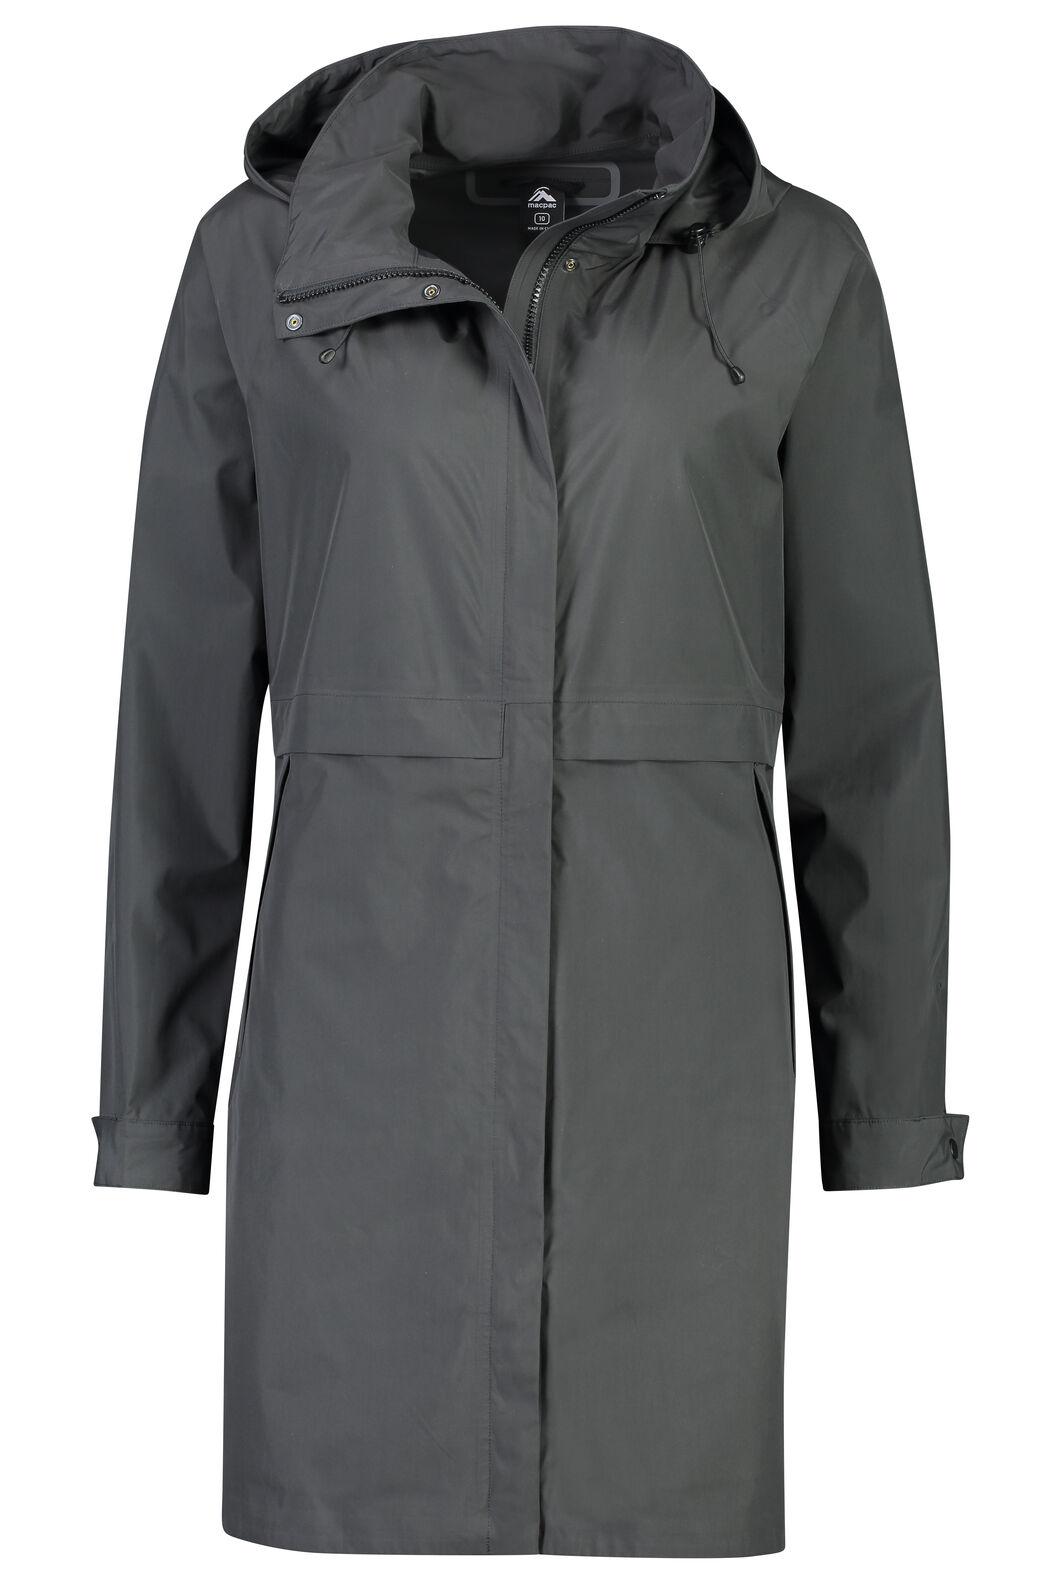 Macpac Incognito Rain Jacket - Women's, Black, hi-res